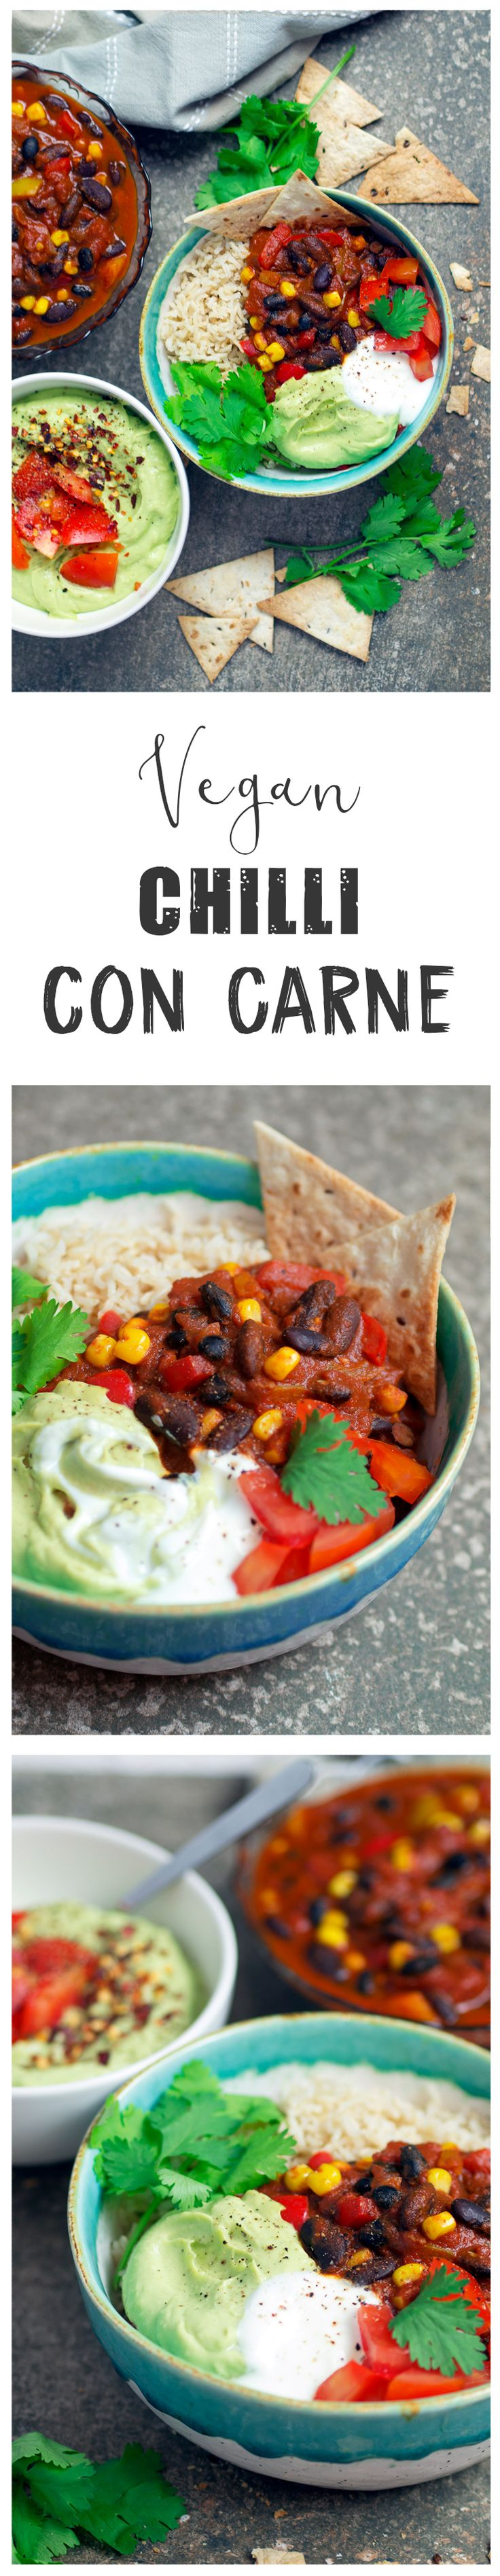 Vegan chilli con carne | Nadias healthy kitchen